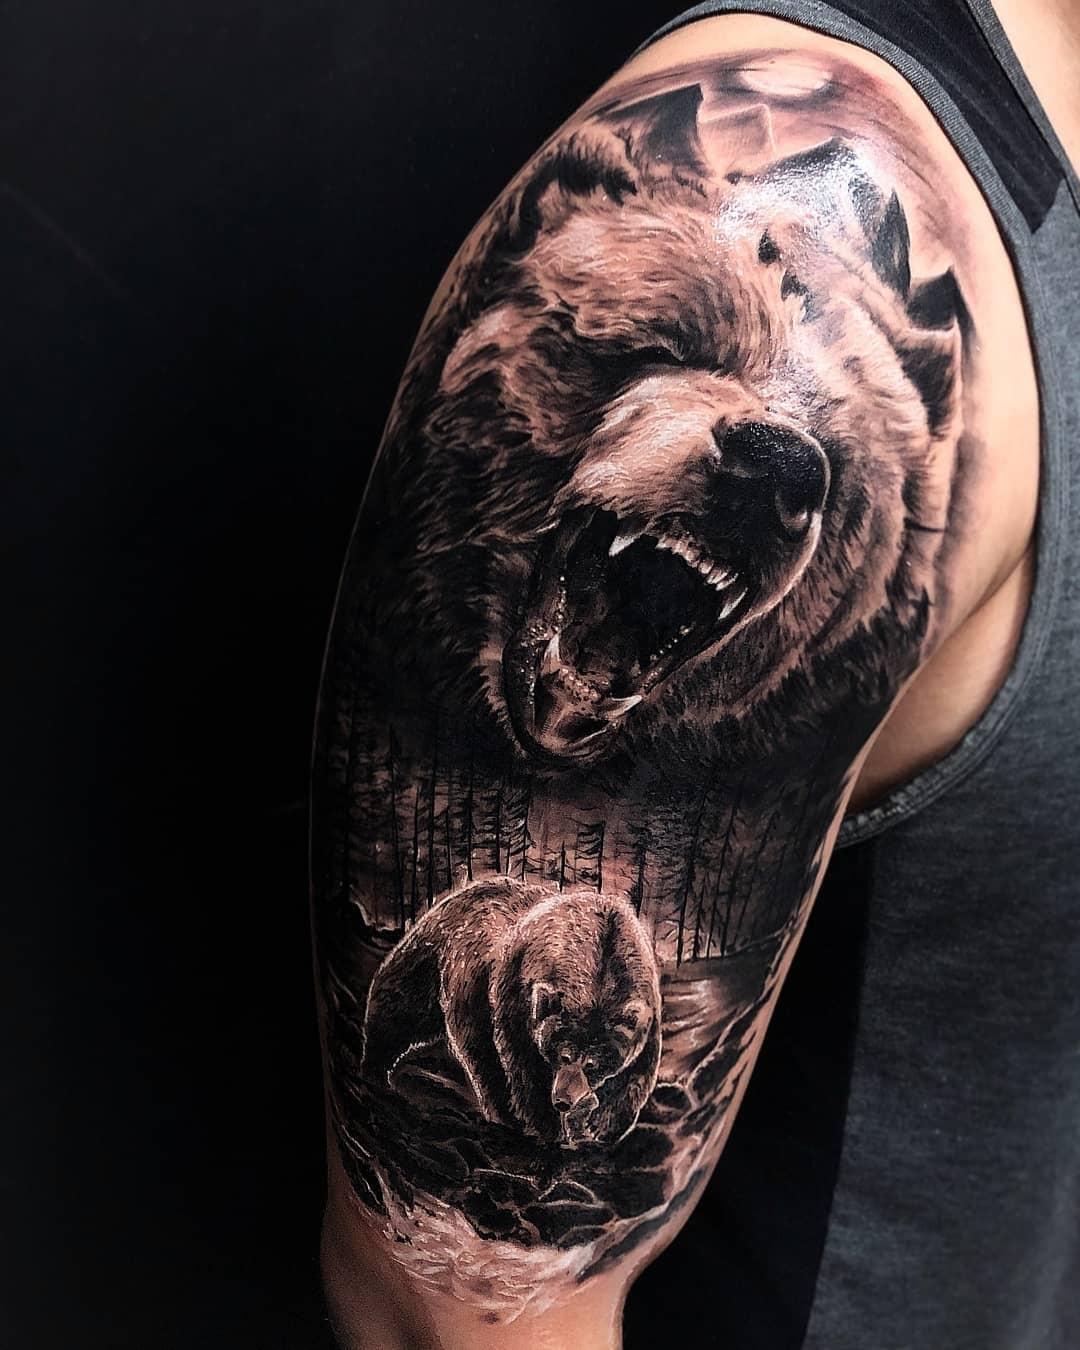 Значение Тату Медведя: на Руке